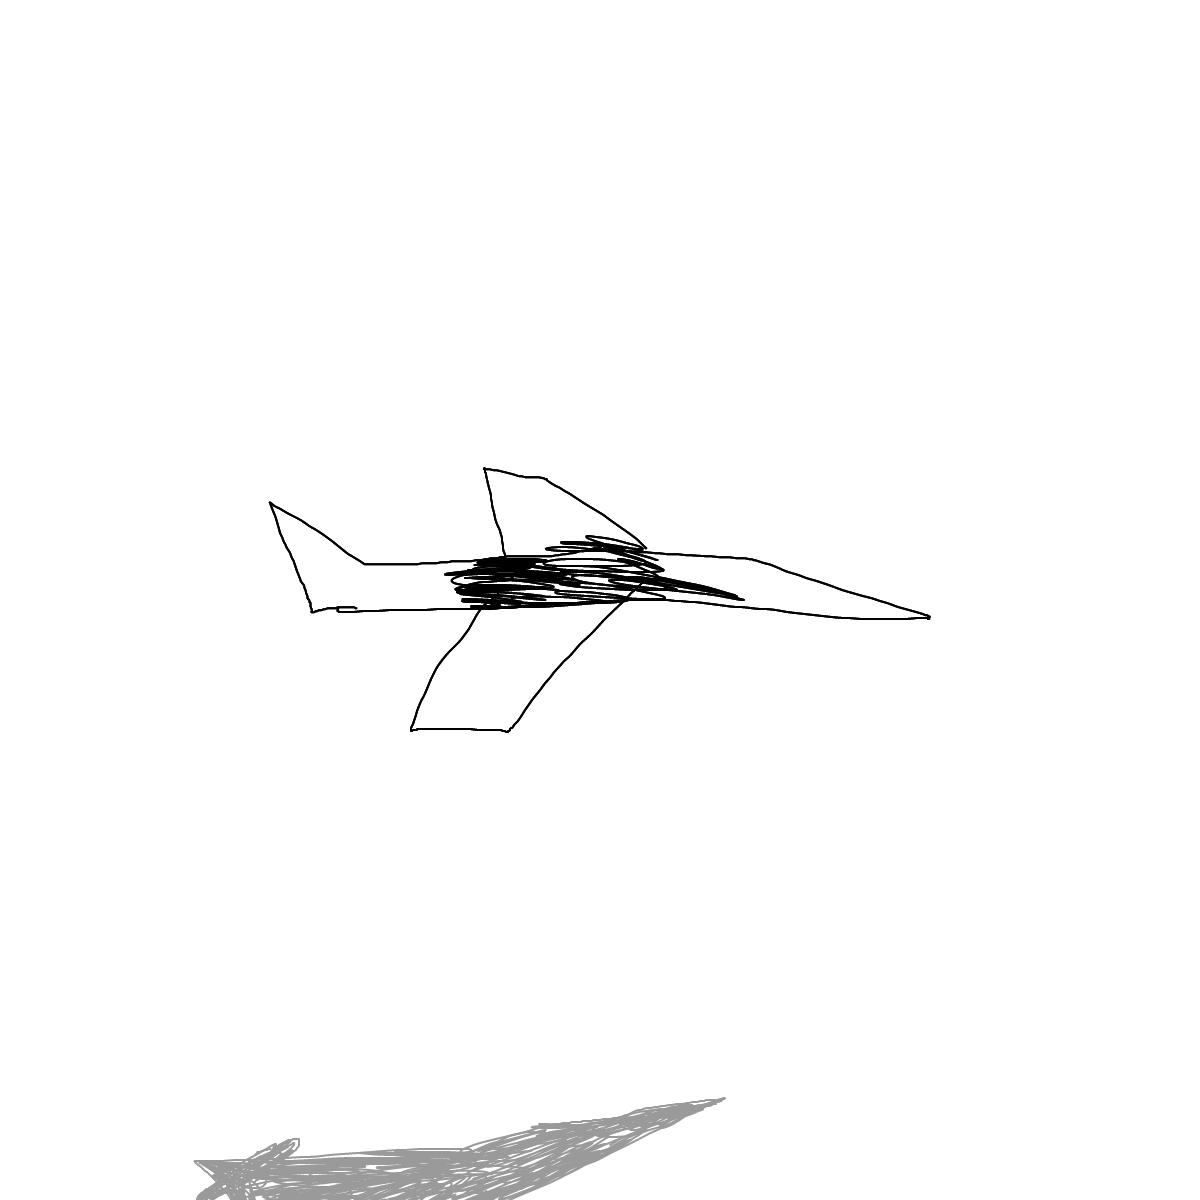 BAAAM drawing#40 lat:52.4751815795898440lng: 13.4067630767822270